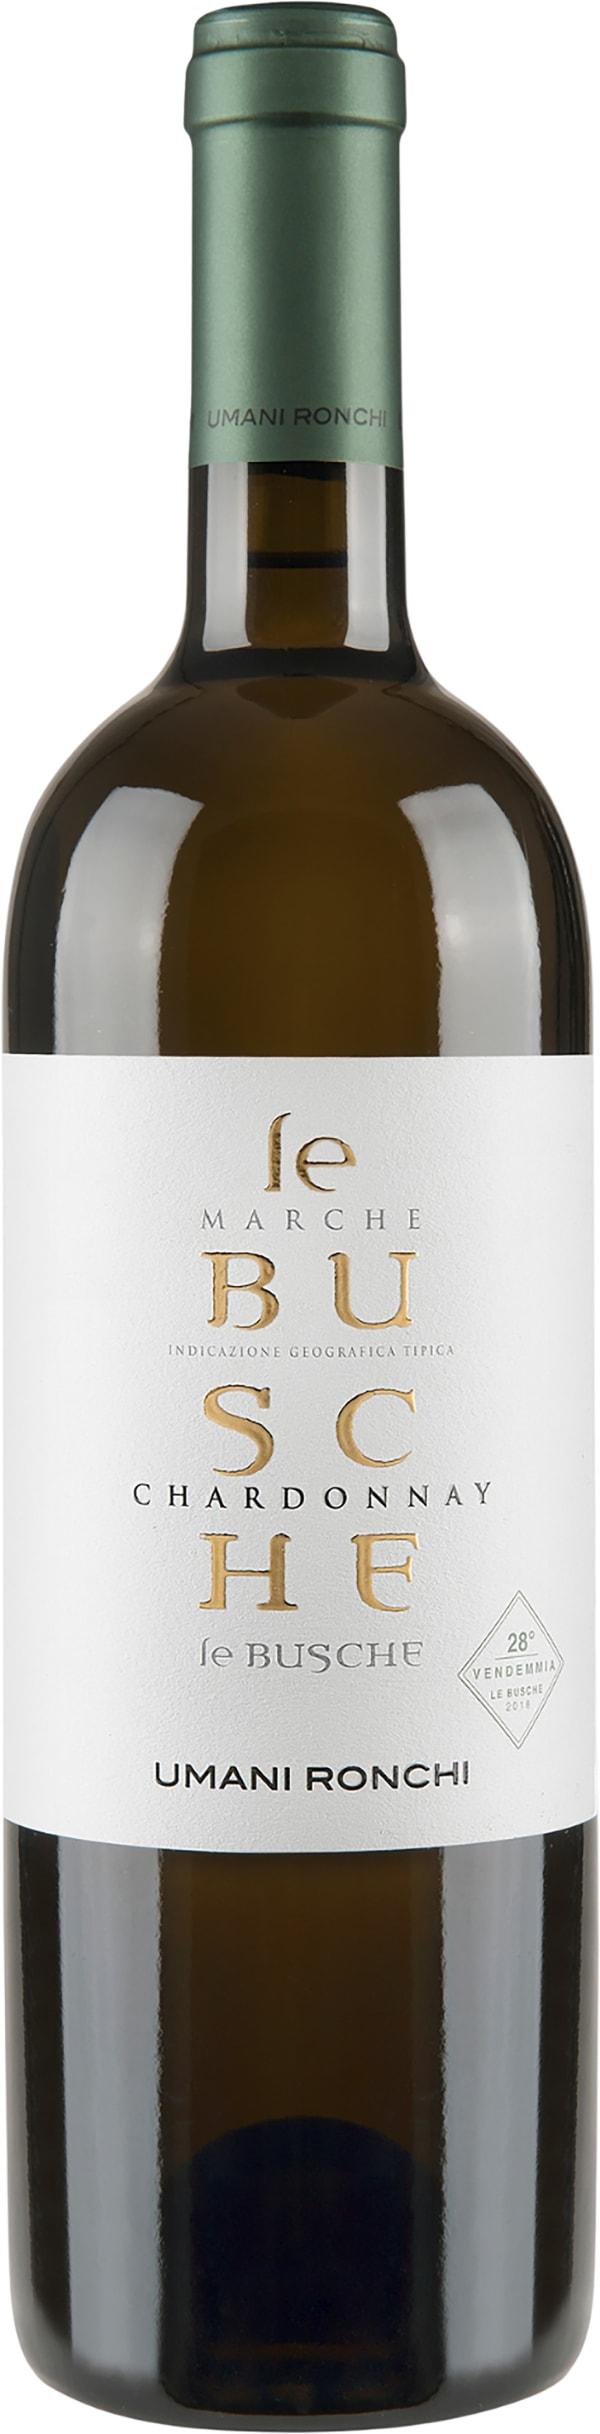 Umani Ronchi Le Busche Chardonnay 2018